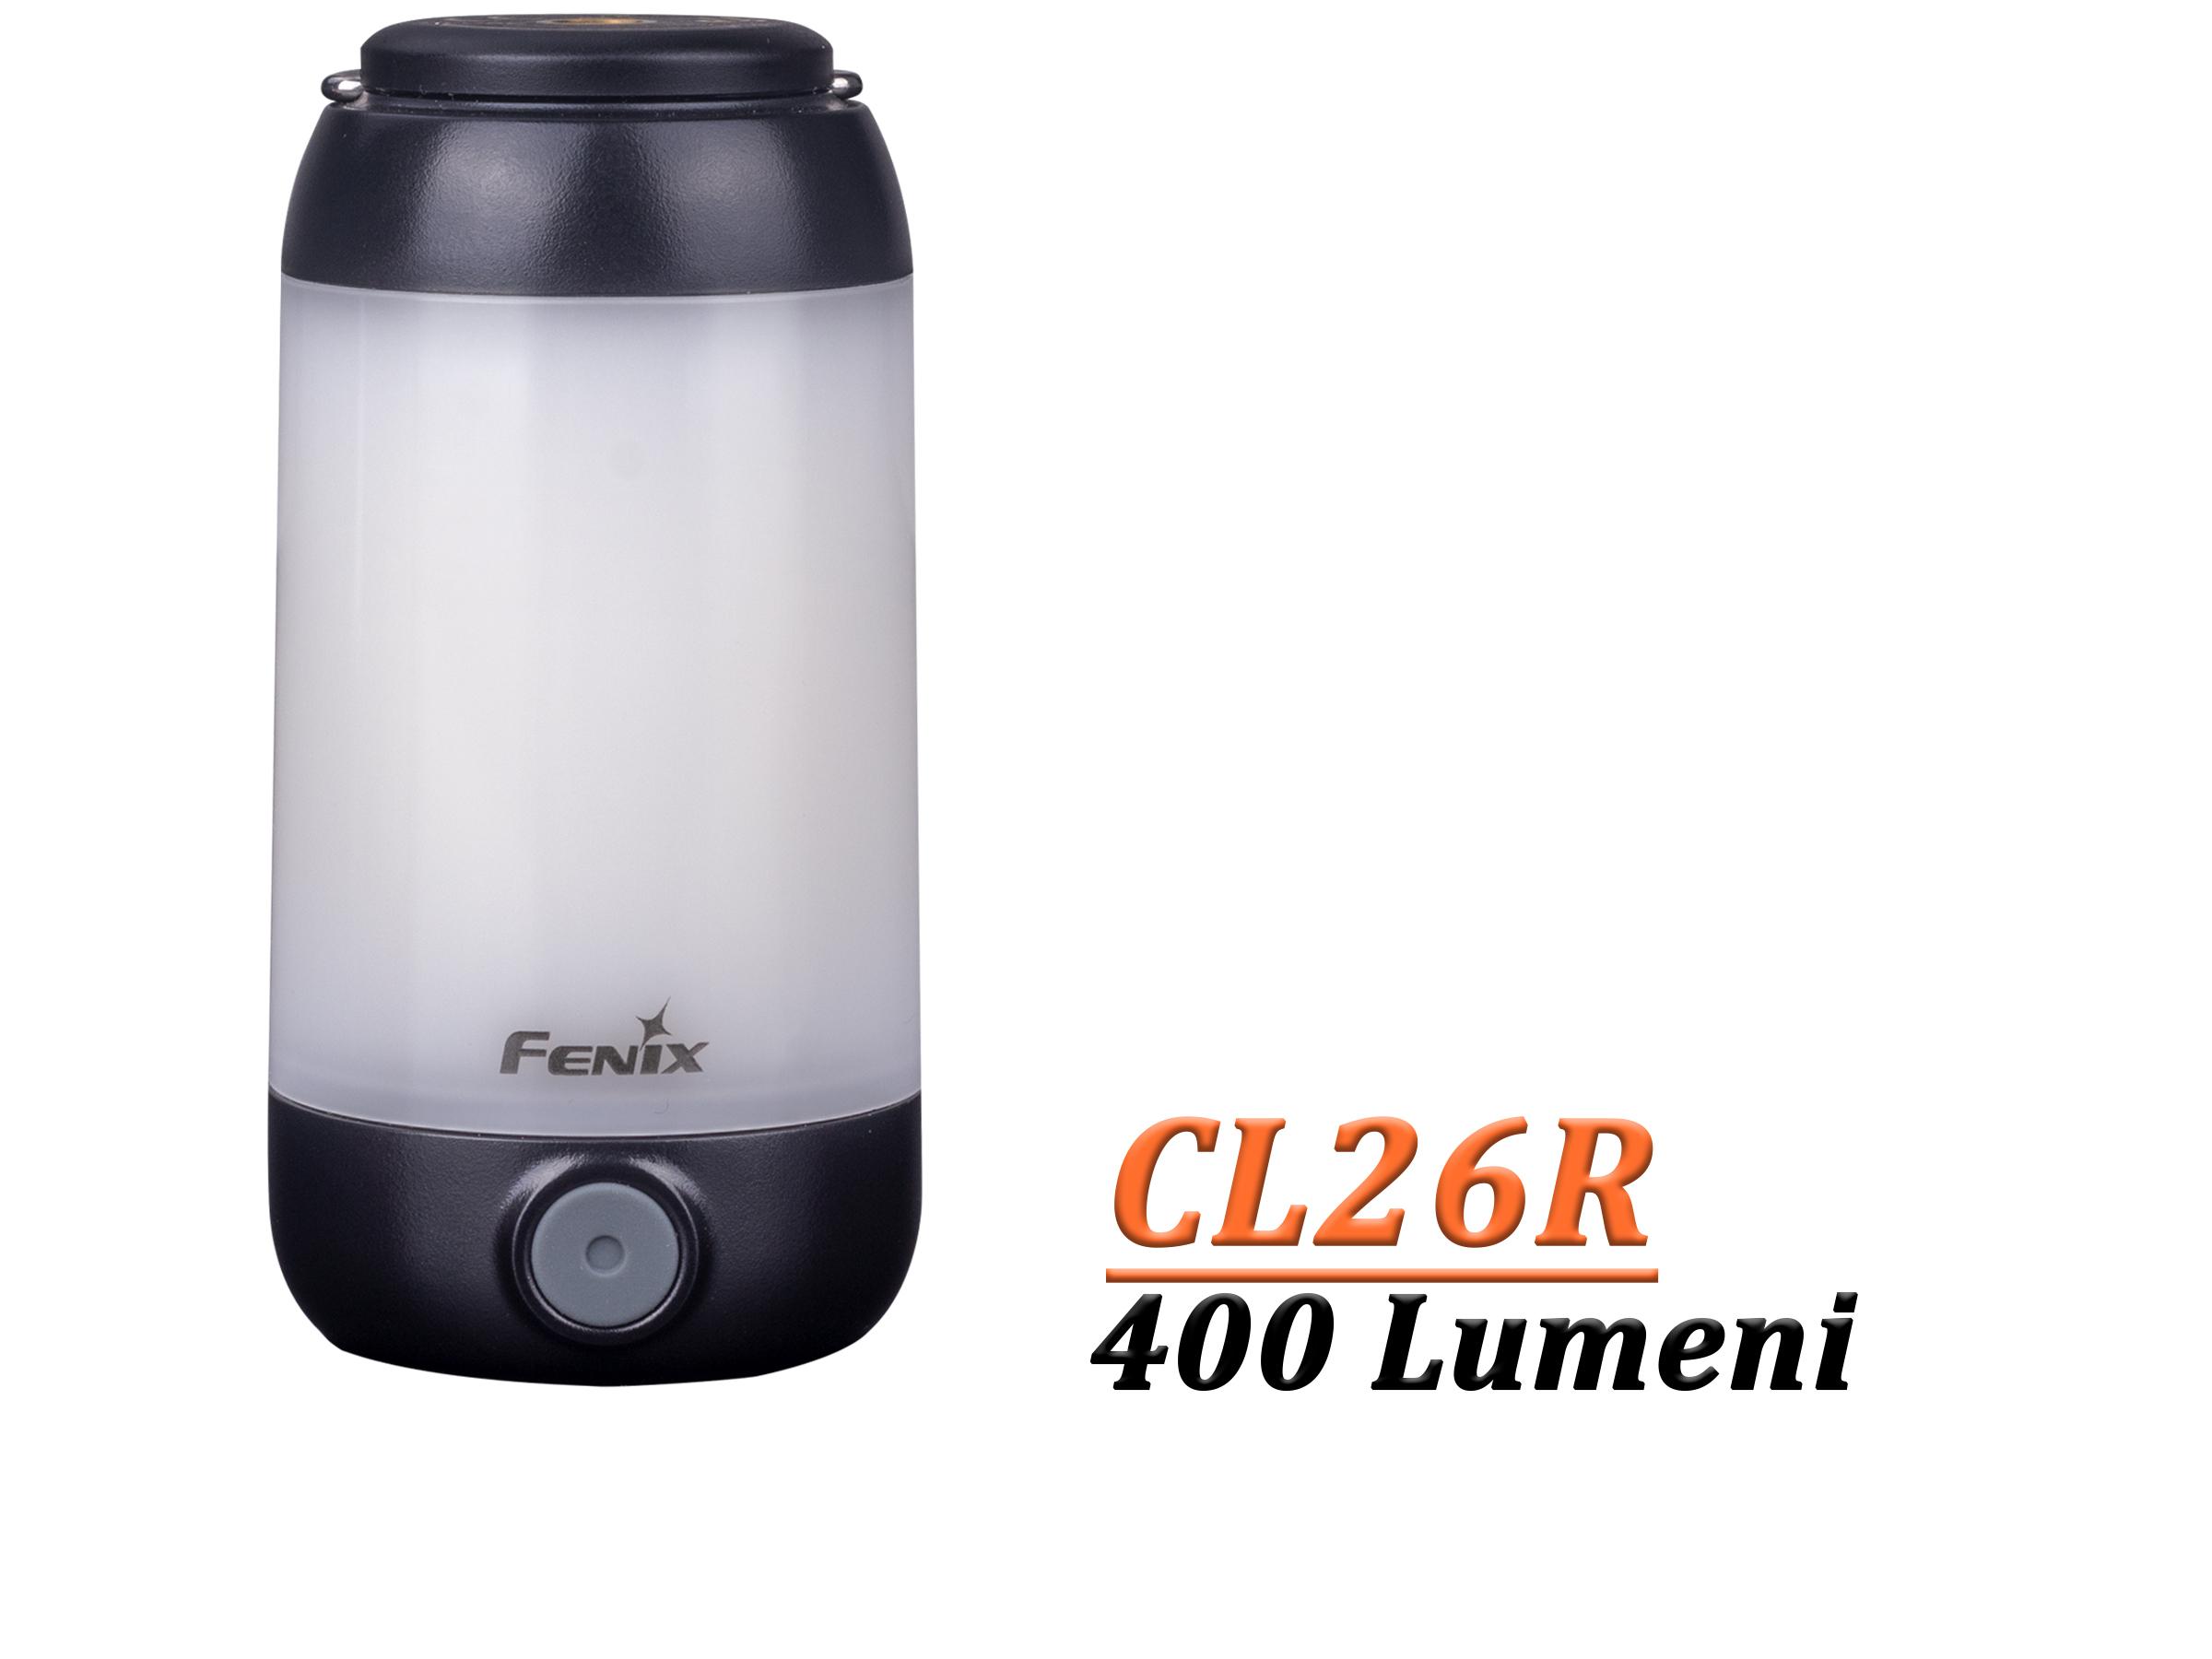 FENIX CL26R - Lanternă camping - 400 Lumeni - 25 metri - Negru